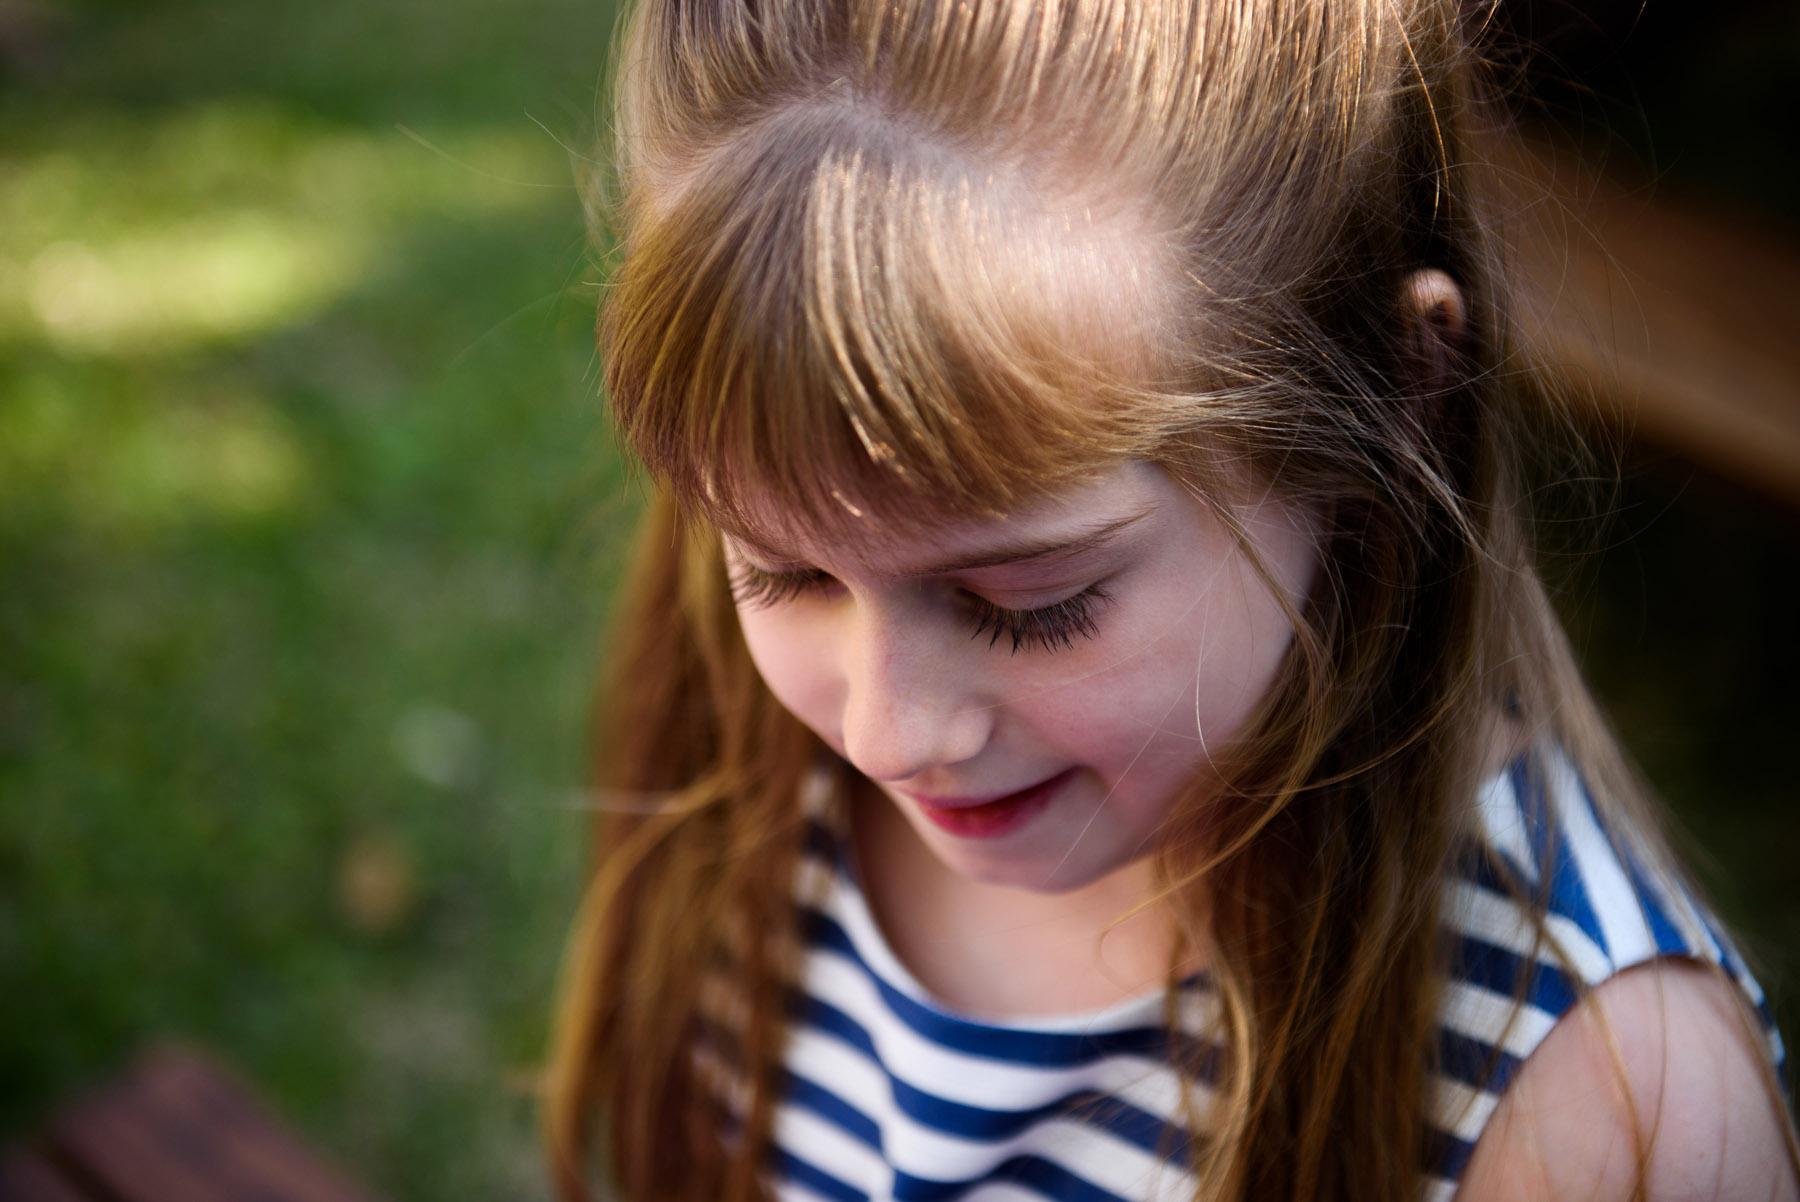 07-aniversario-infantil-curitiba-fotografo-infantil-festa-infantil-curitiba-alice.jpg